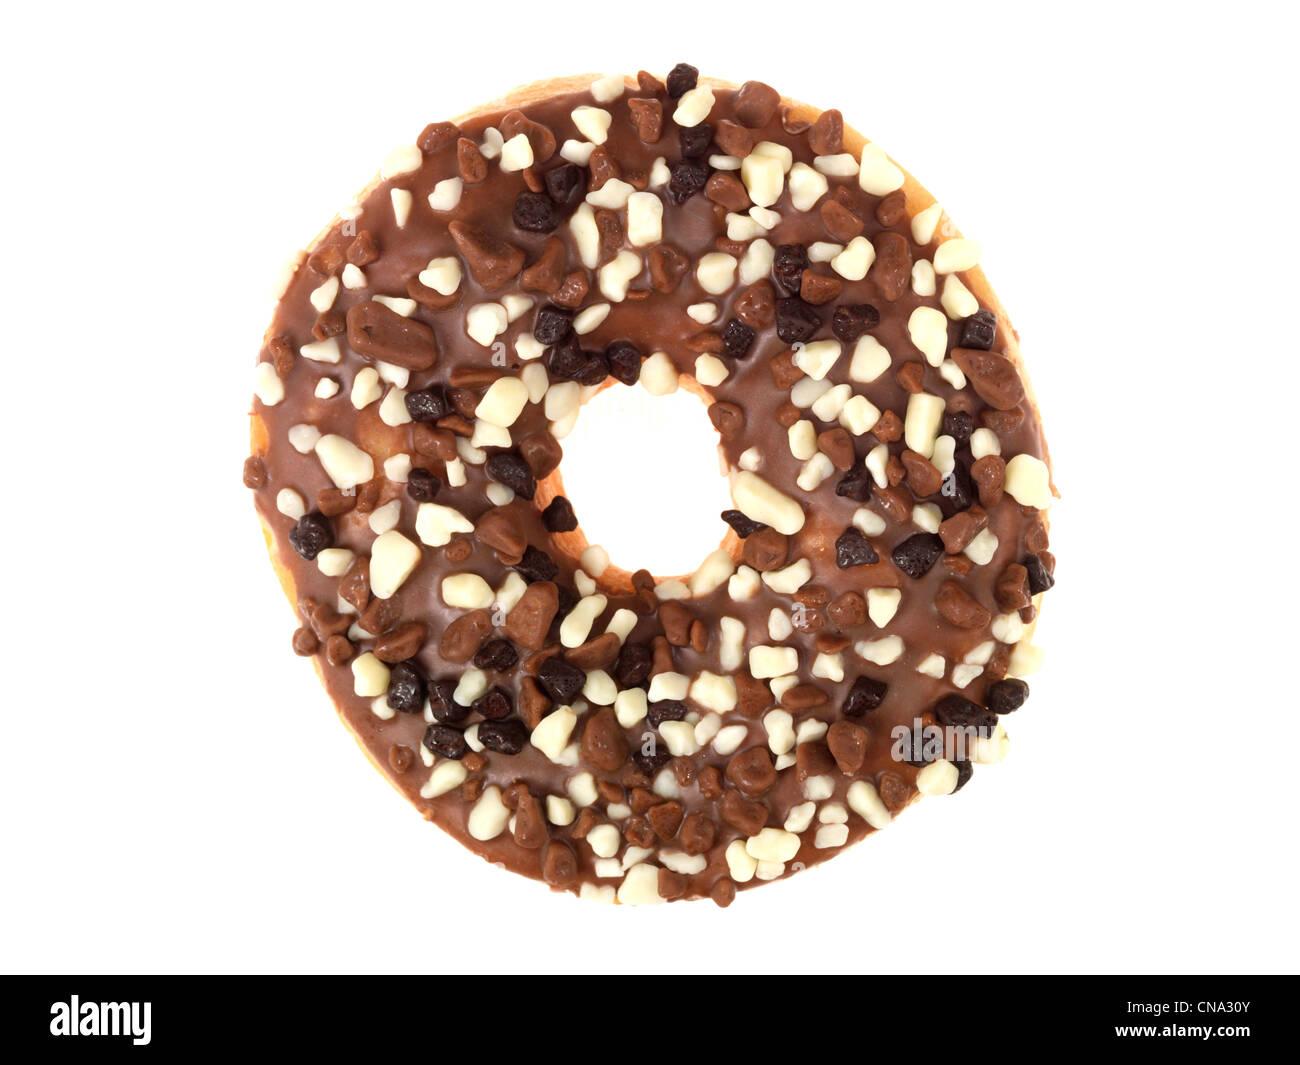 Chocolate Covered Donut Stock Photo